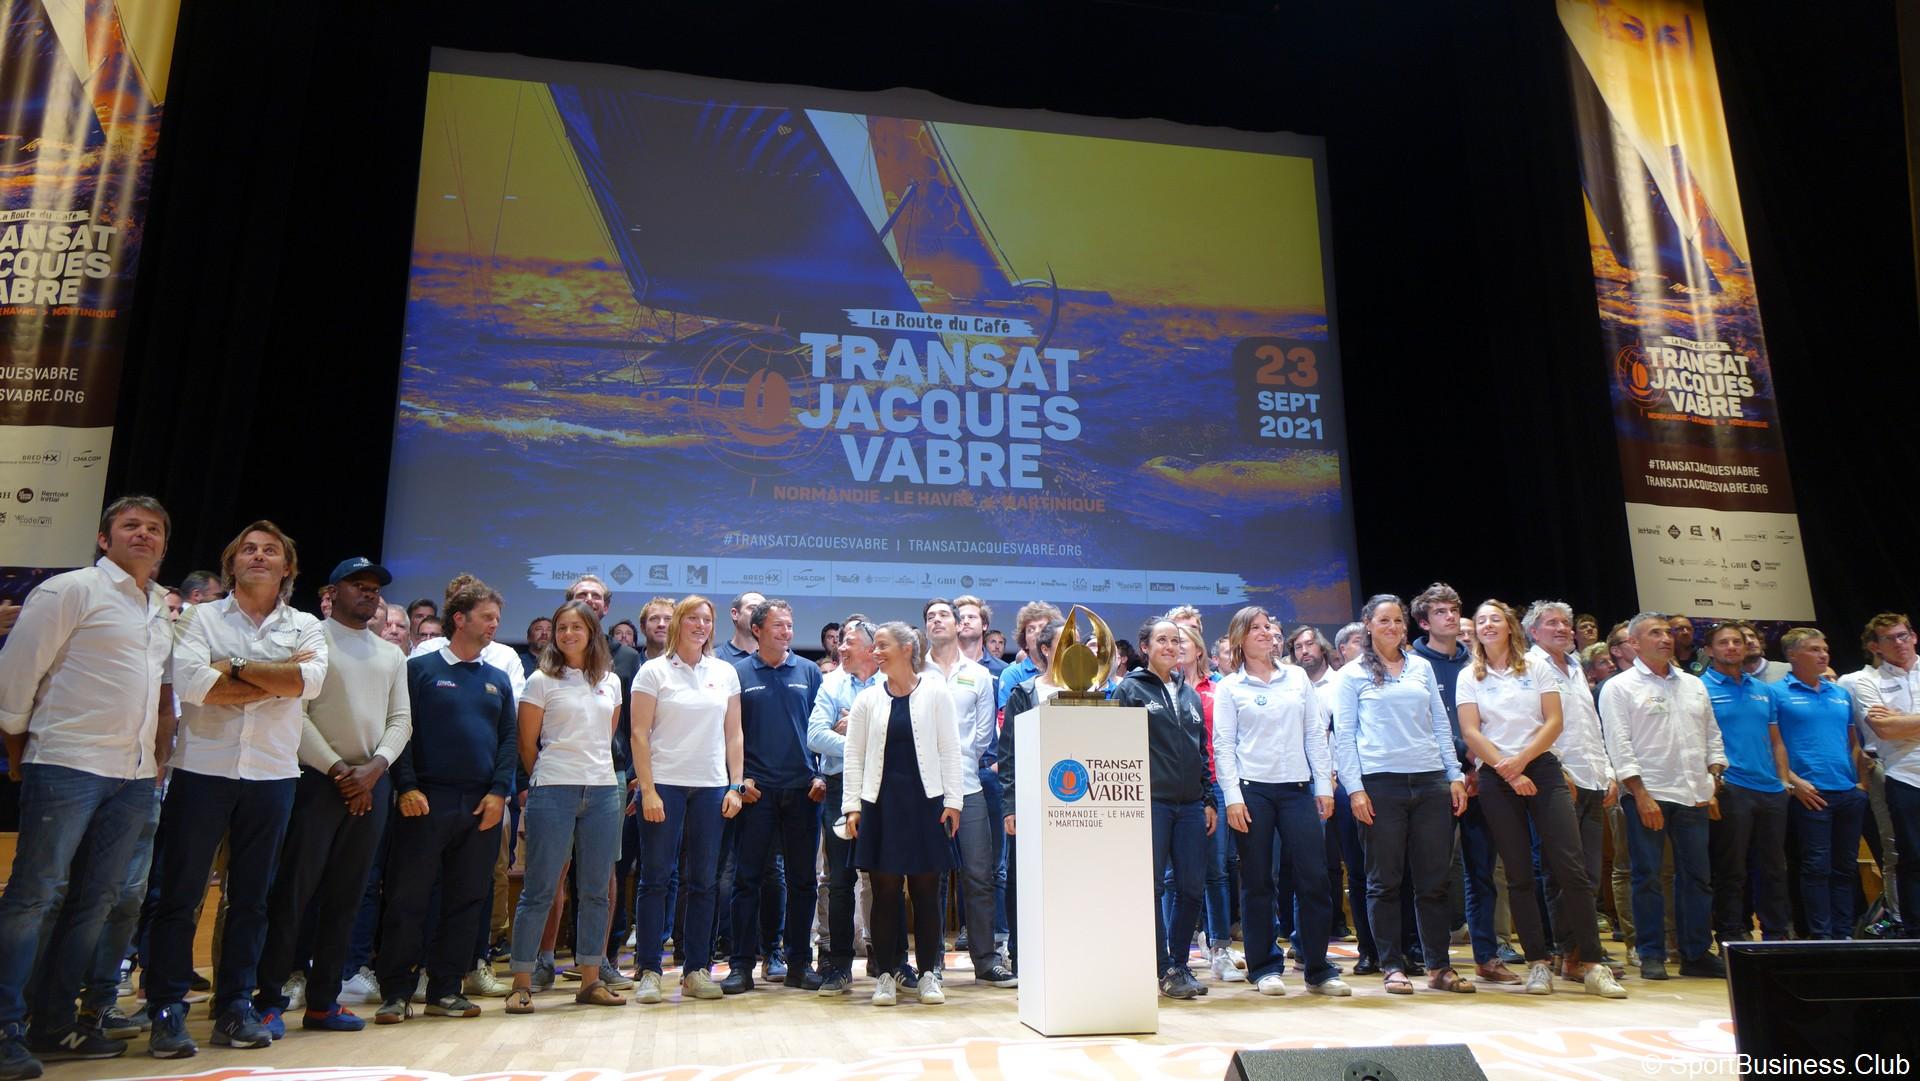 Transat Jacques Vabre – skippers